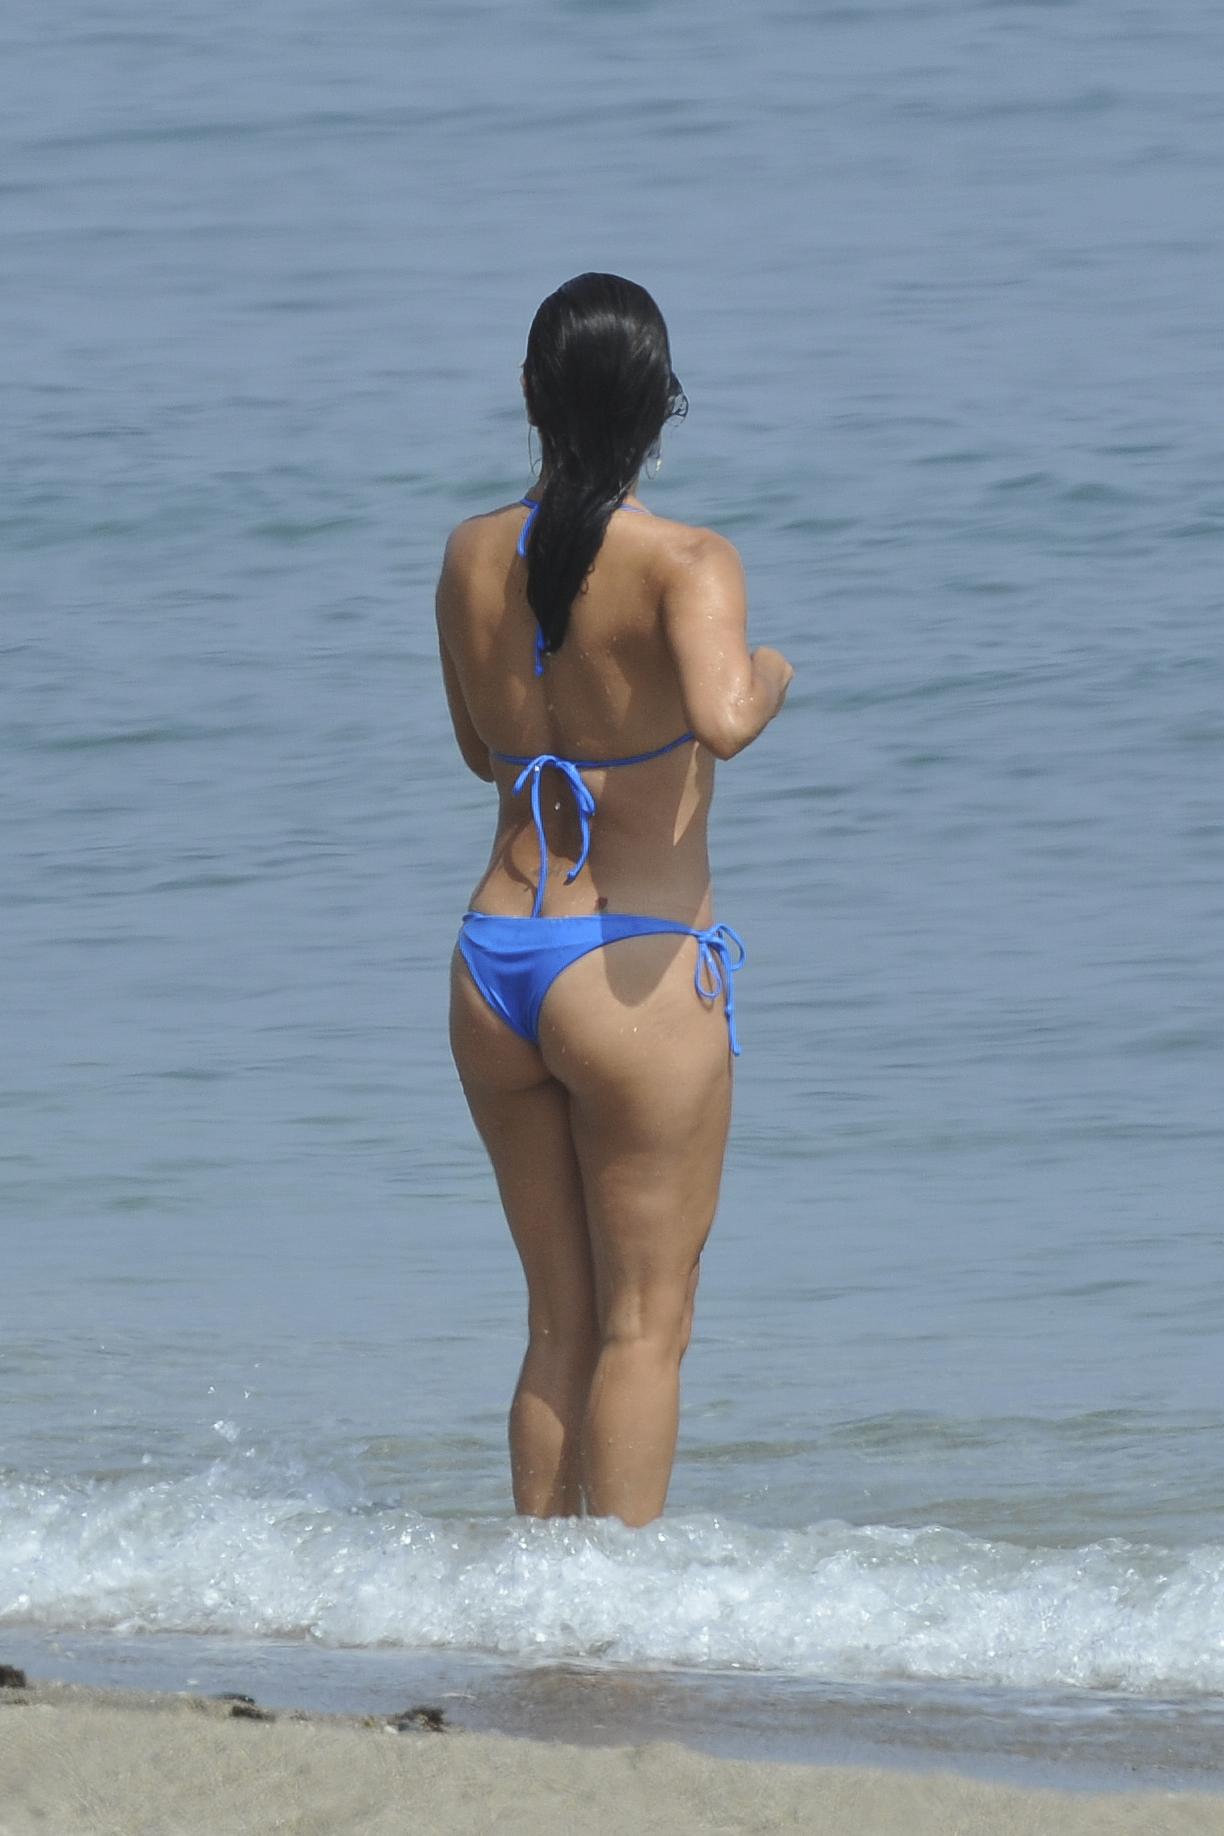 Eva longoria in blue bikini on the beach in ibiza naked (74 photo), Hot Celebrity photos